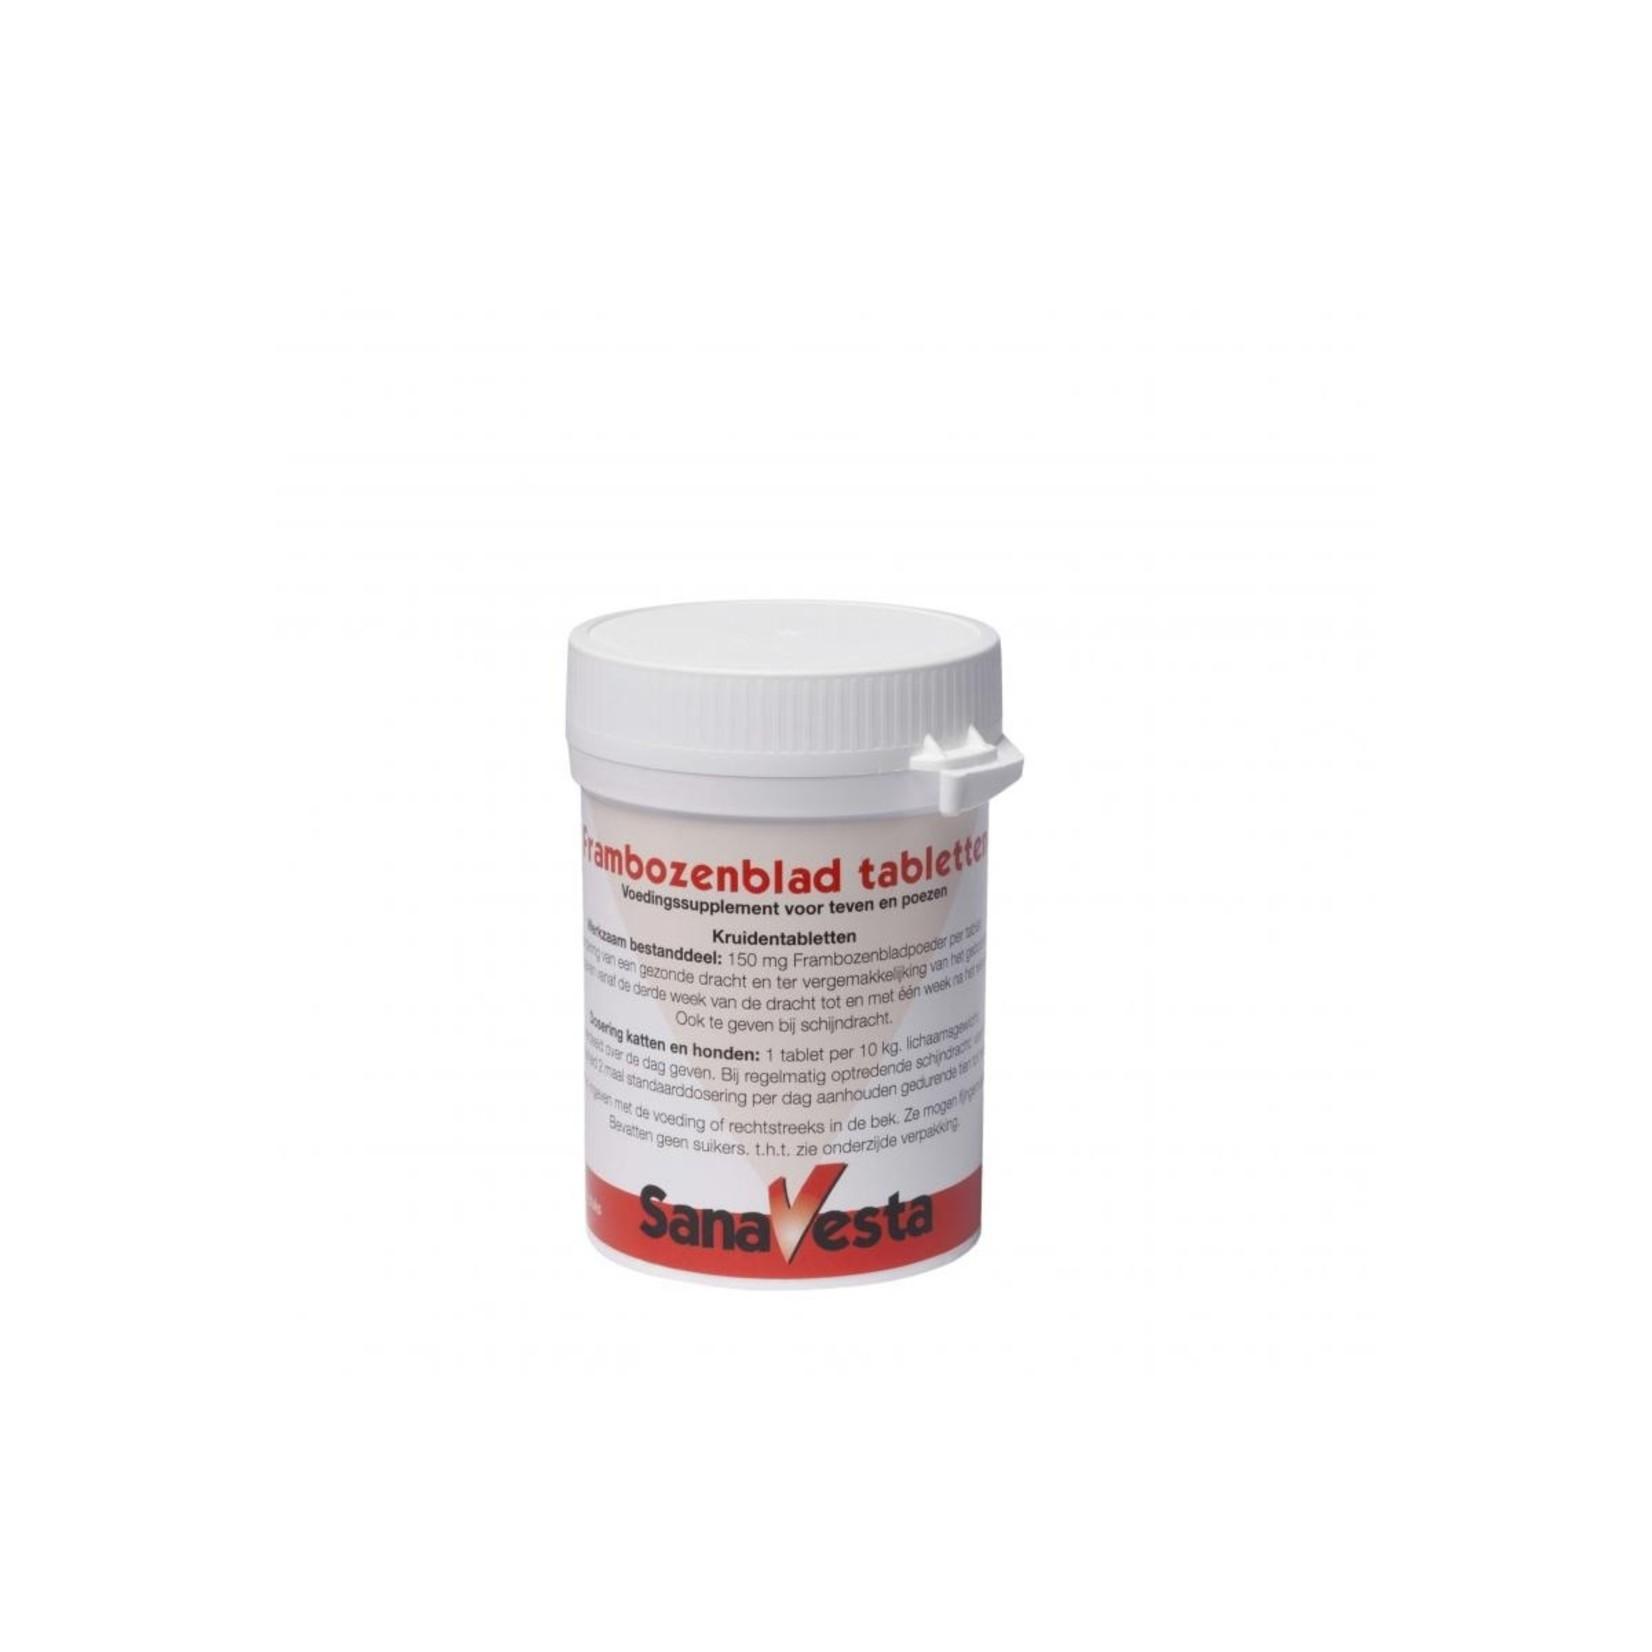 Frambozenblad Tabletten